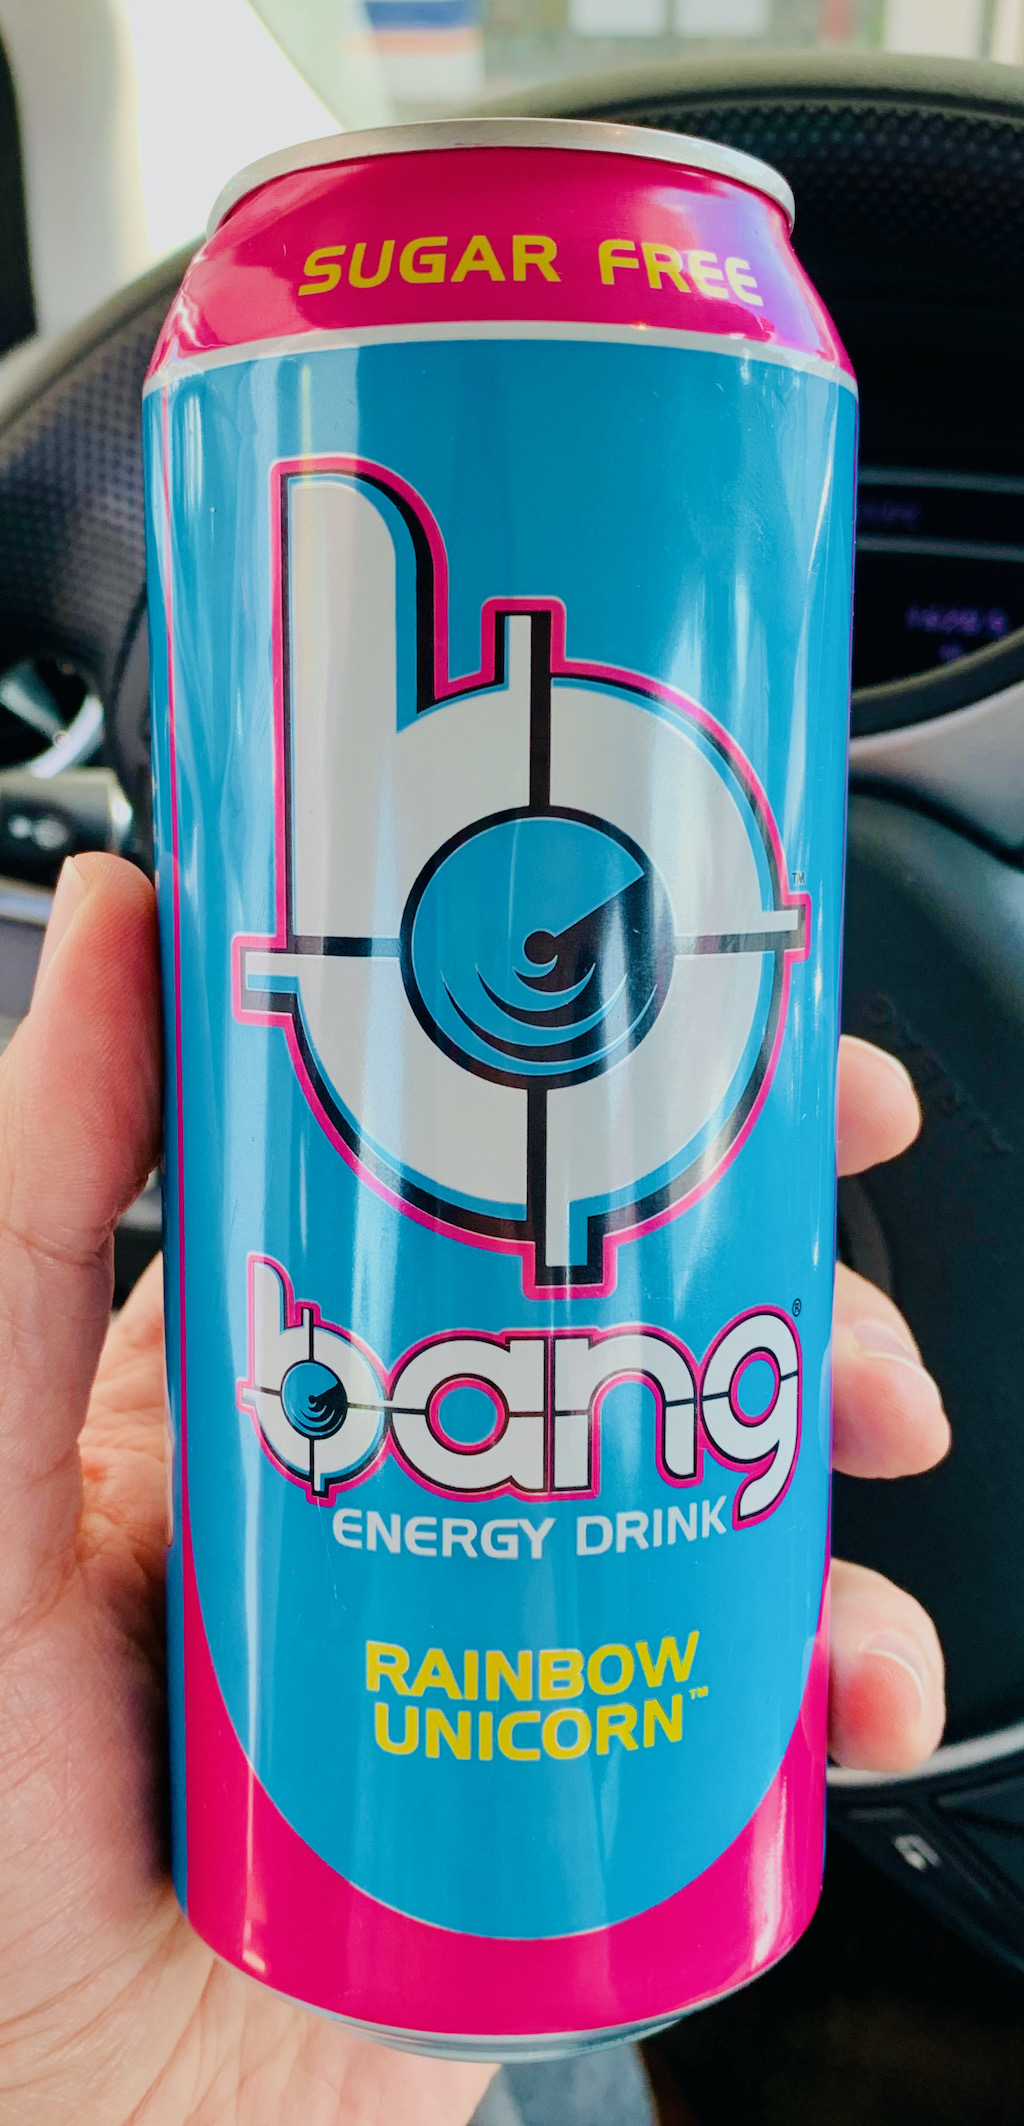 bang Energy Drink sugarfree Rainbow Unicorn Dose